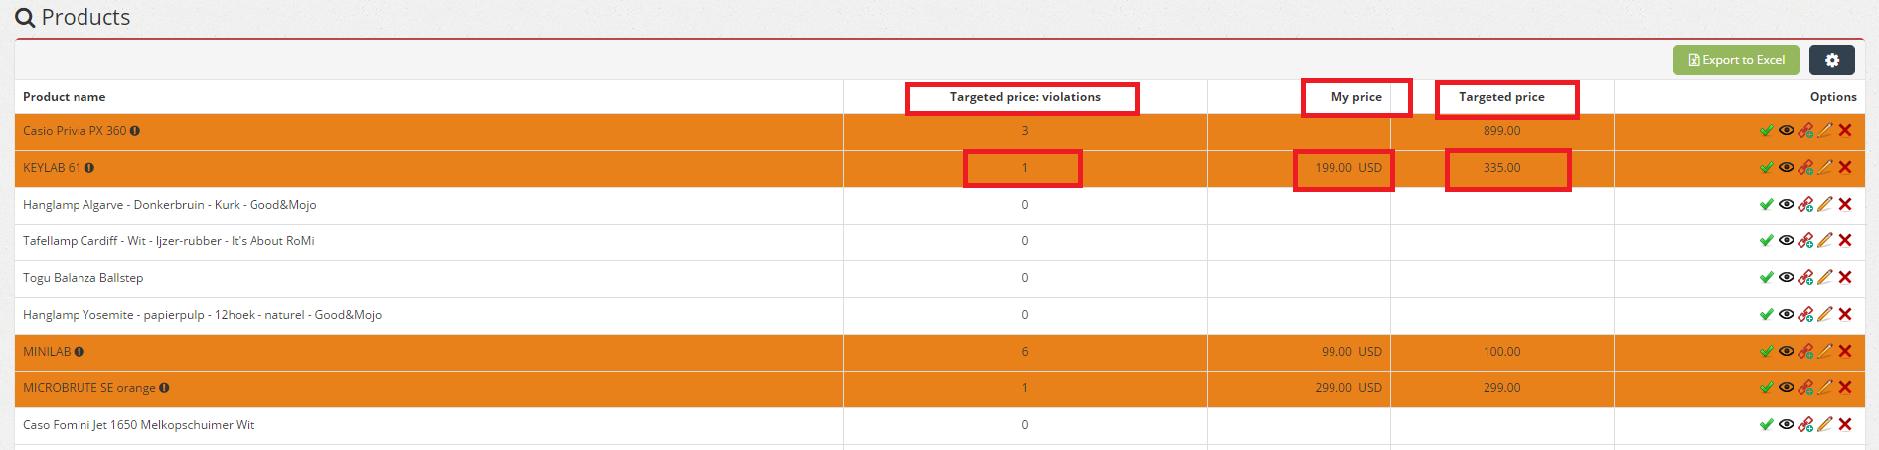 Targeted price violations